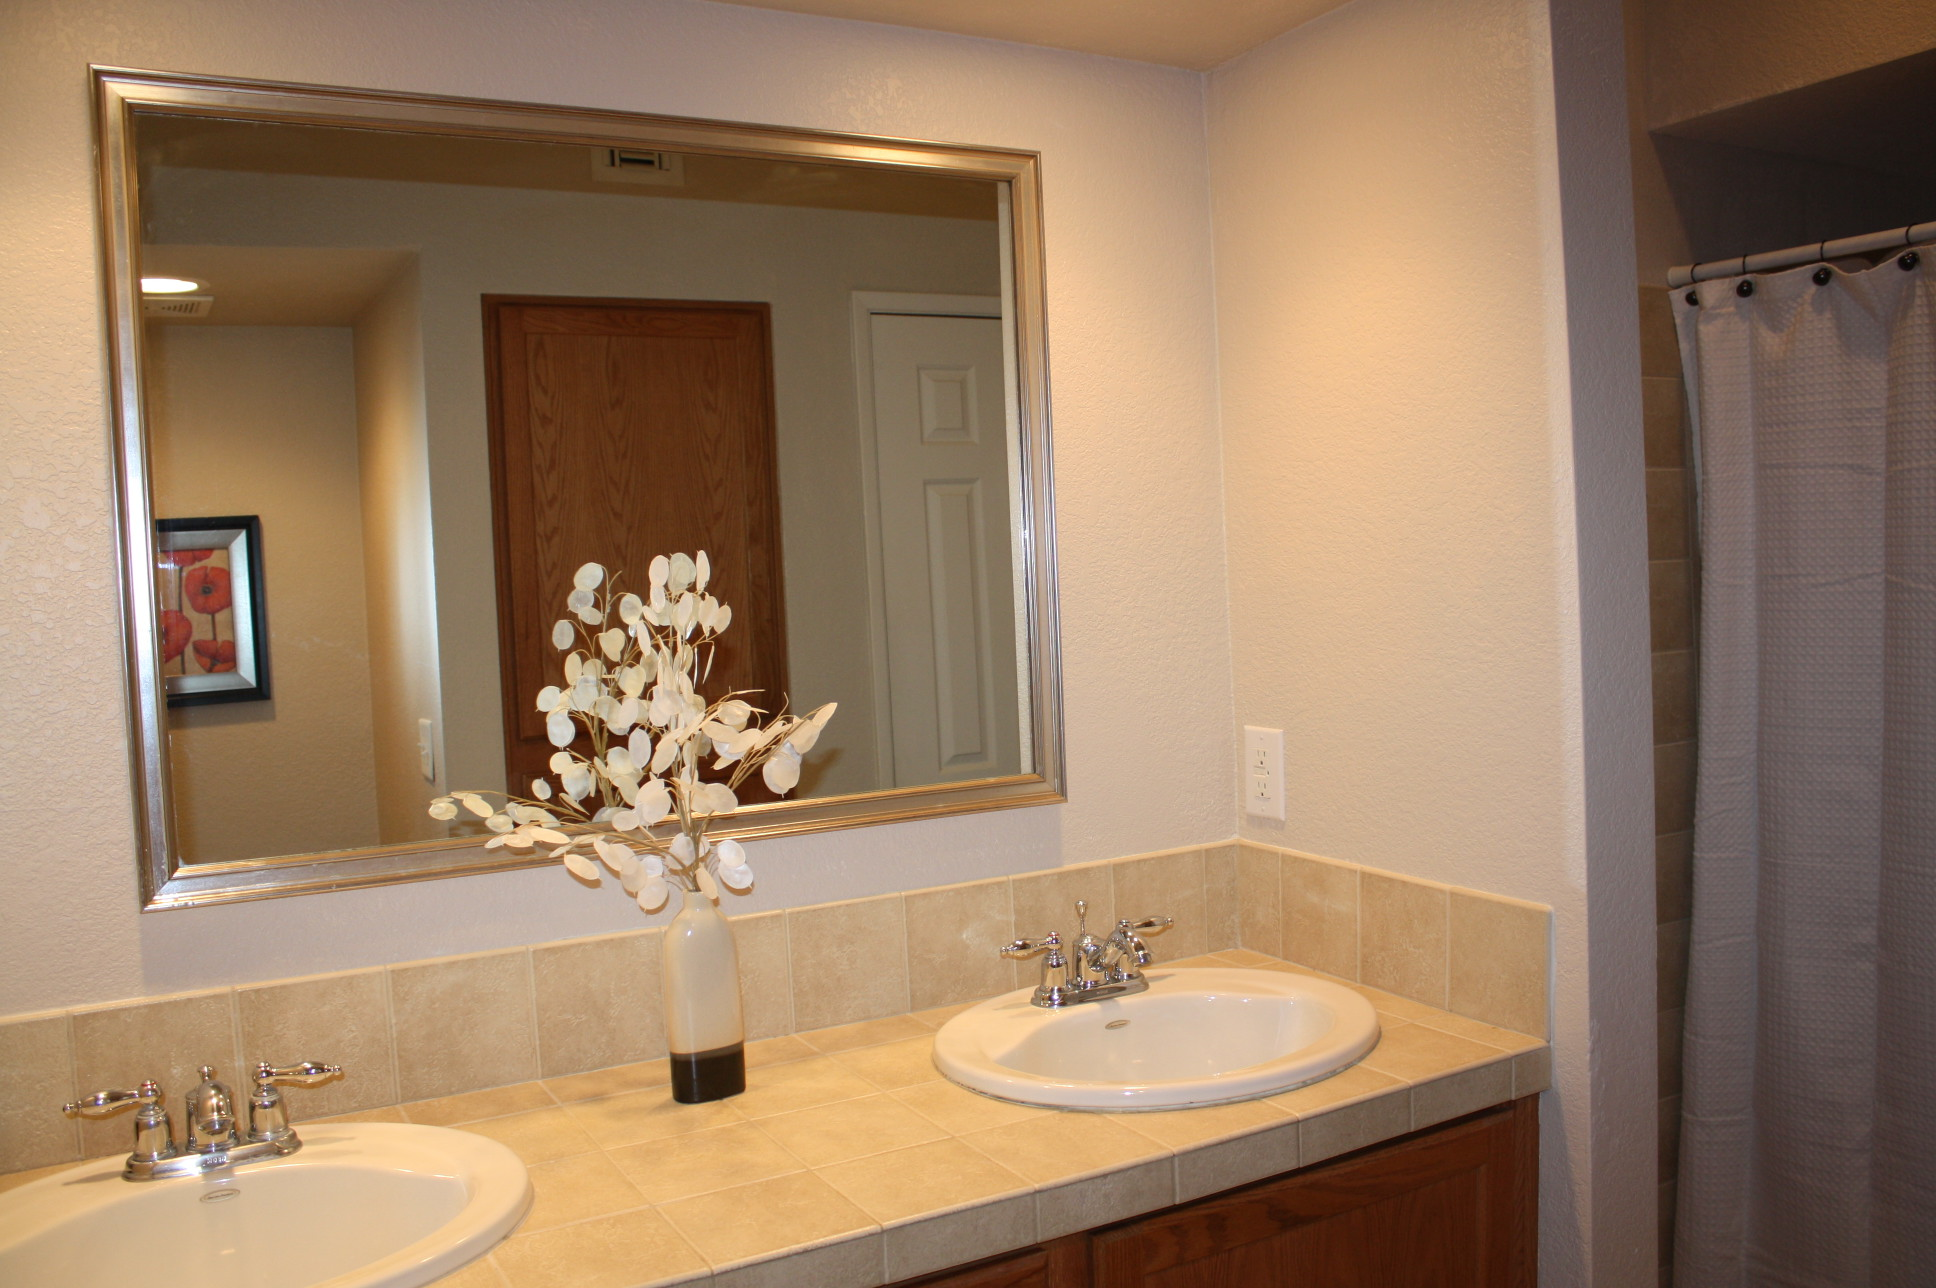 Bathroom Sinks Tucson tucson furnished rentals in ventana vista |